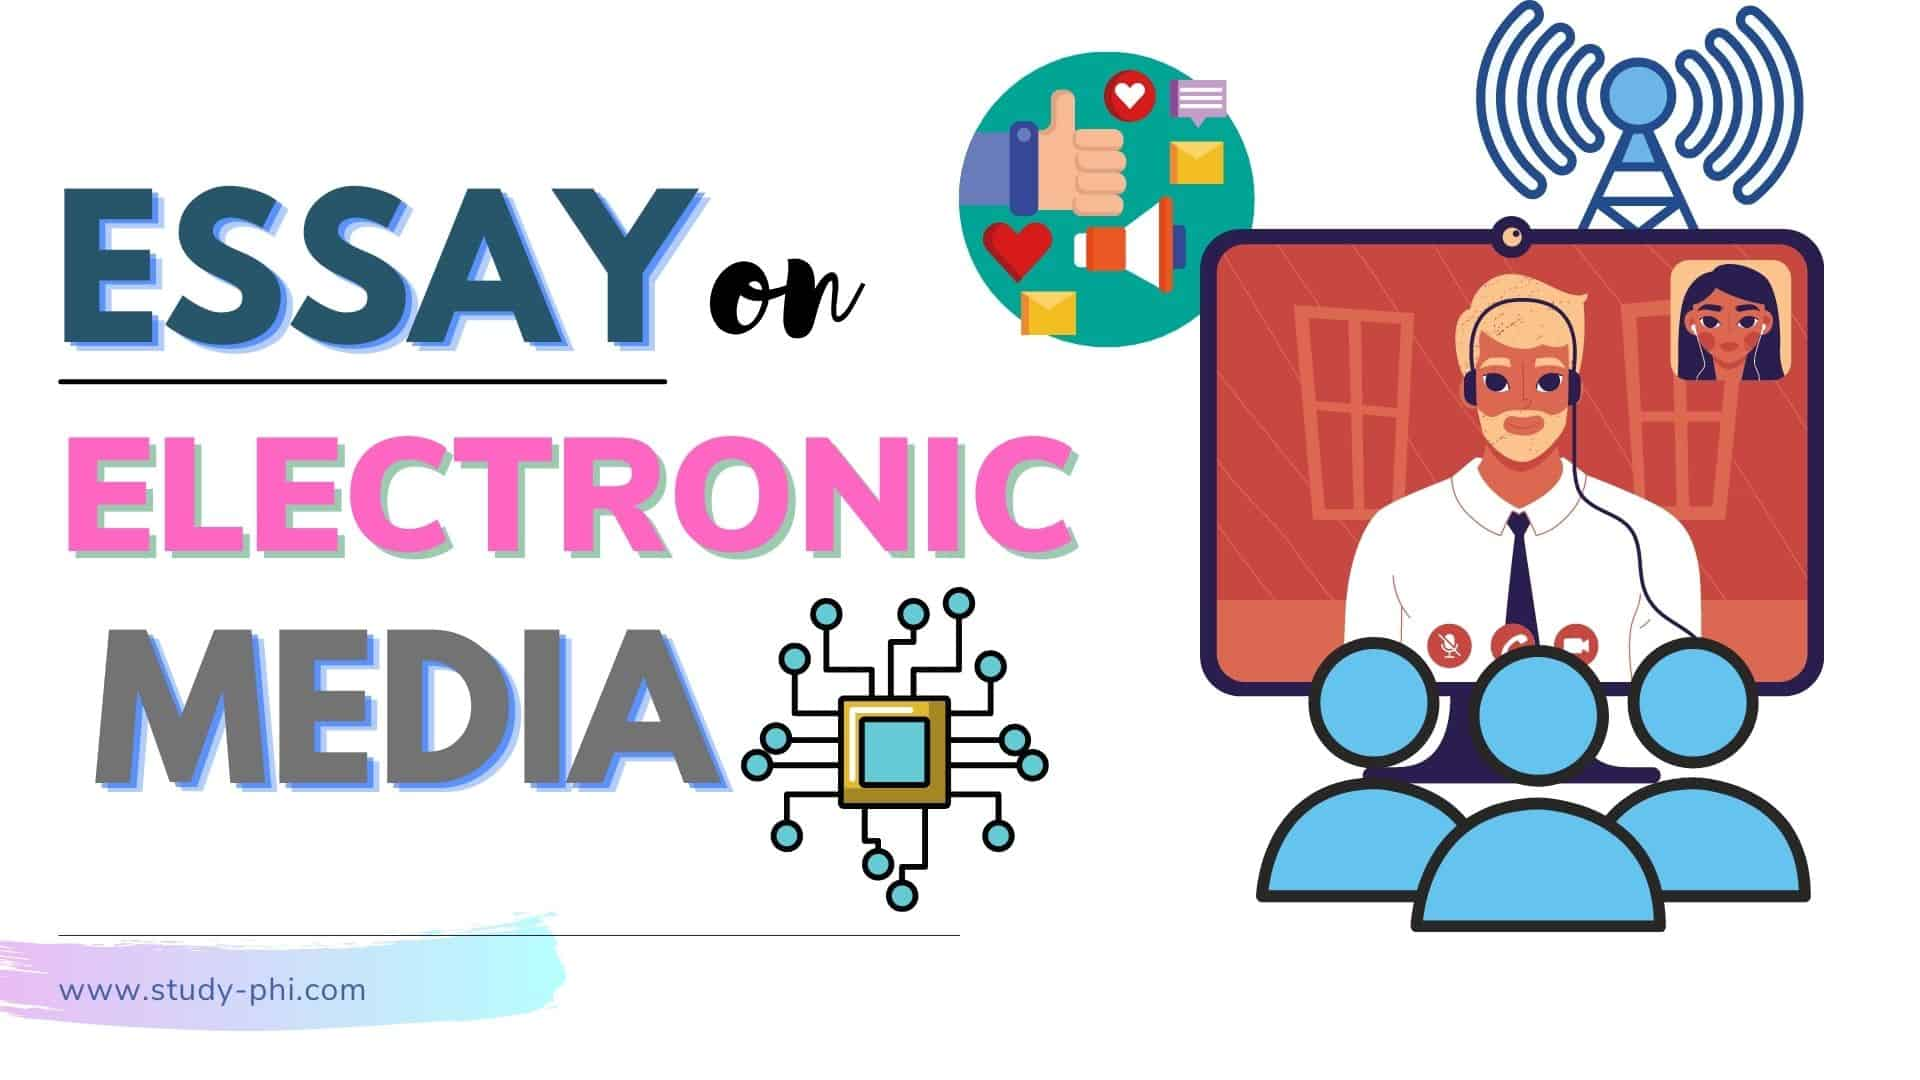 Essay on Electronic Media